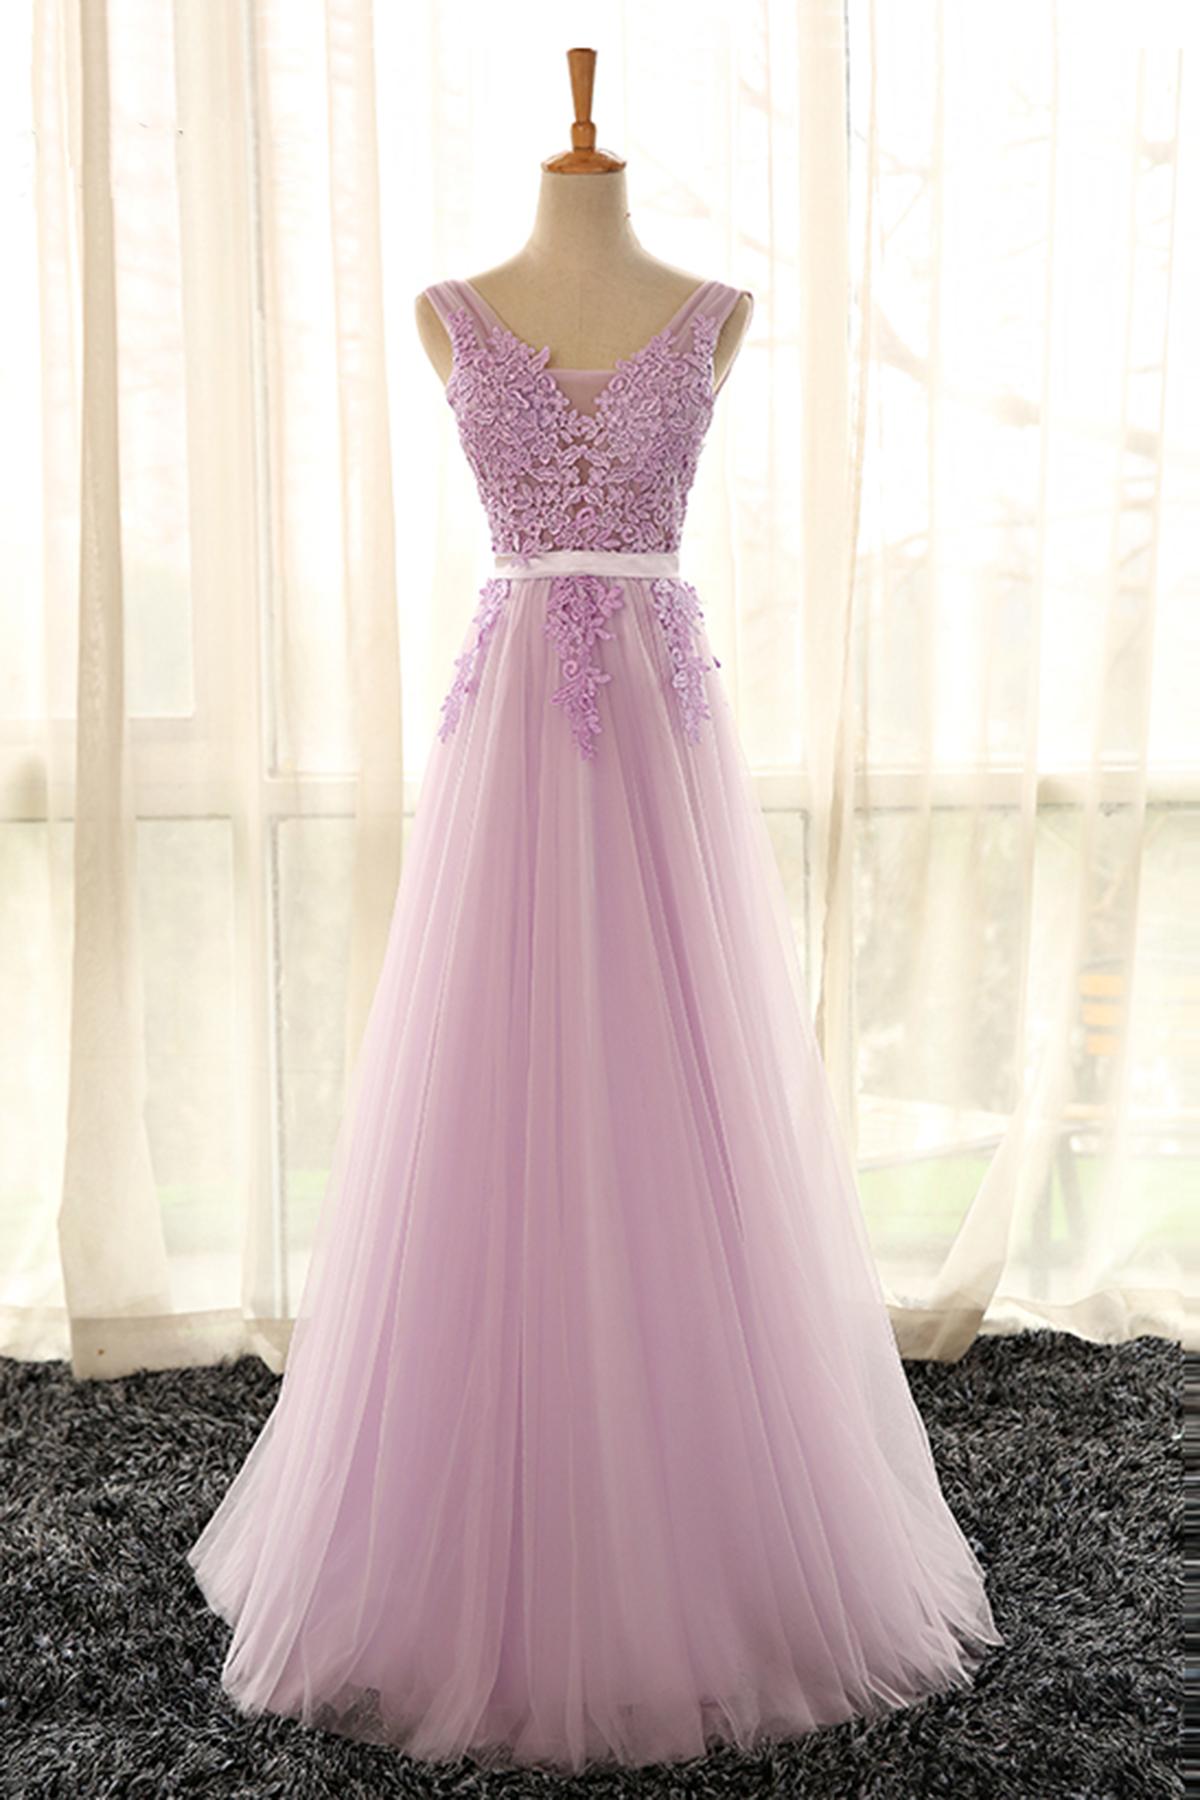 Lace lilac prom dress 2019